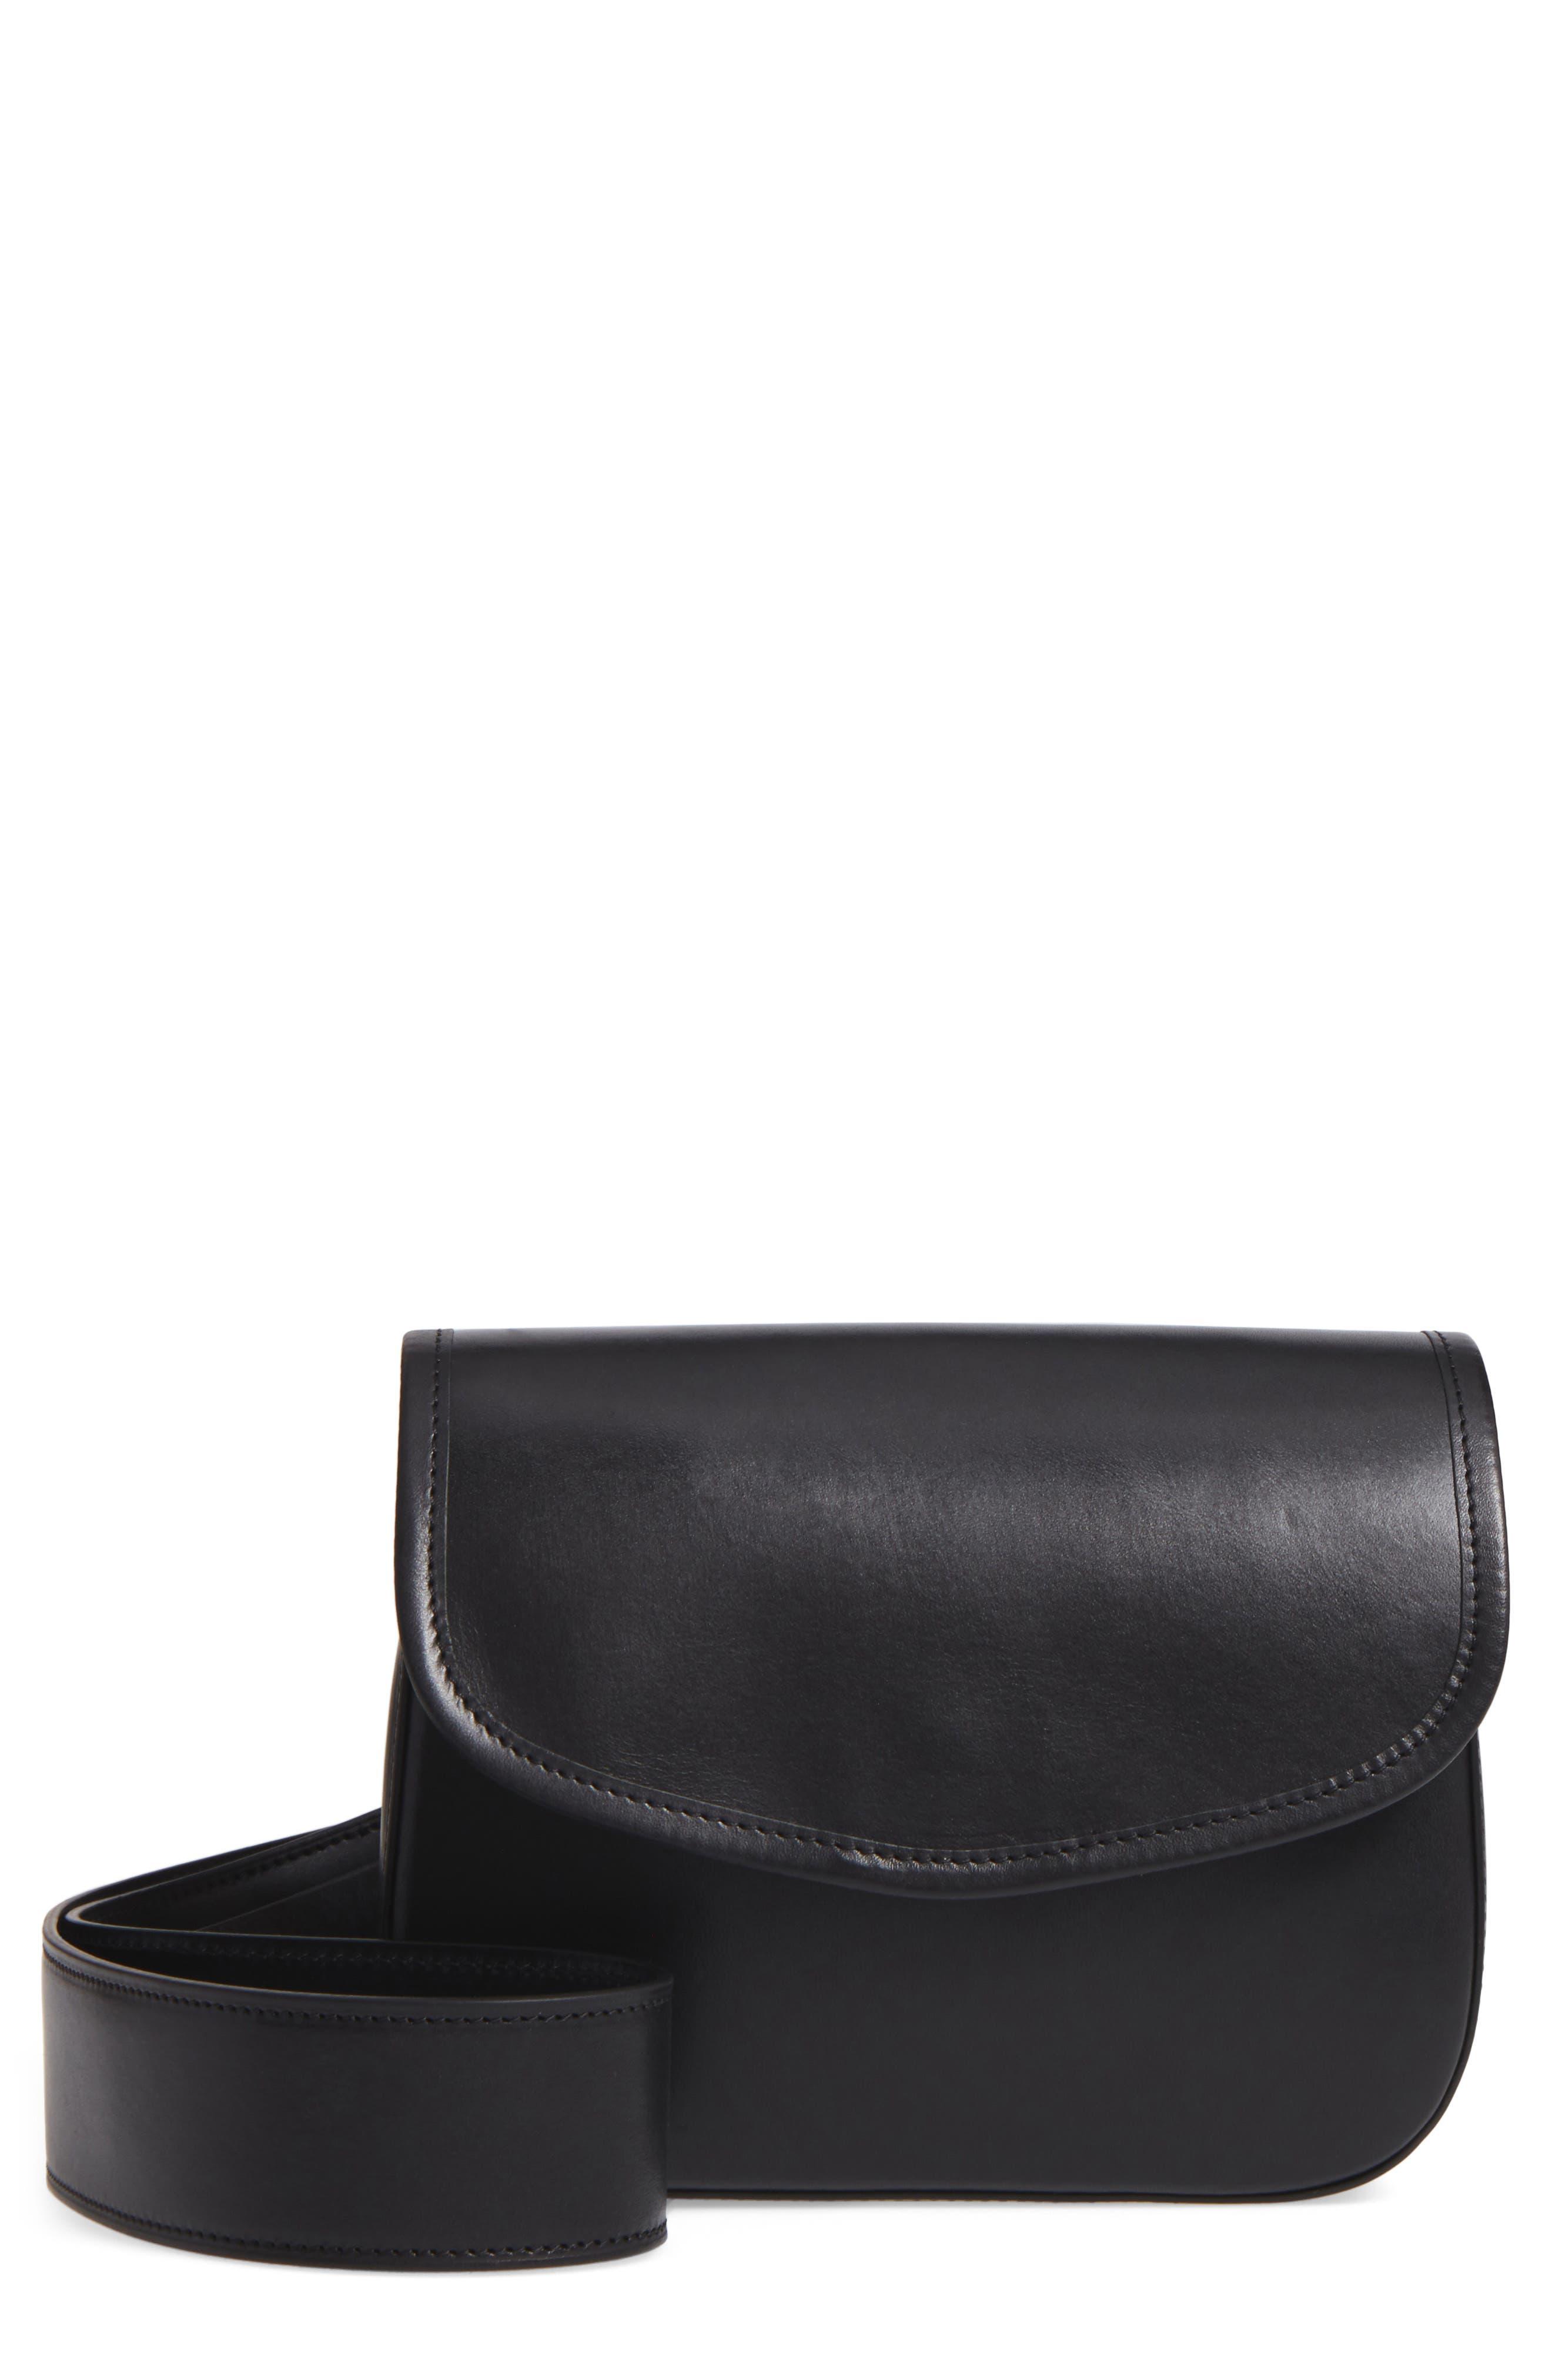 Main Image - Simone Rocha Small Flap Crossbody Bag